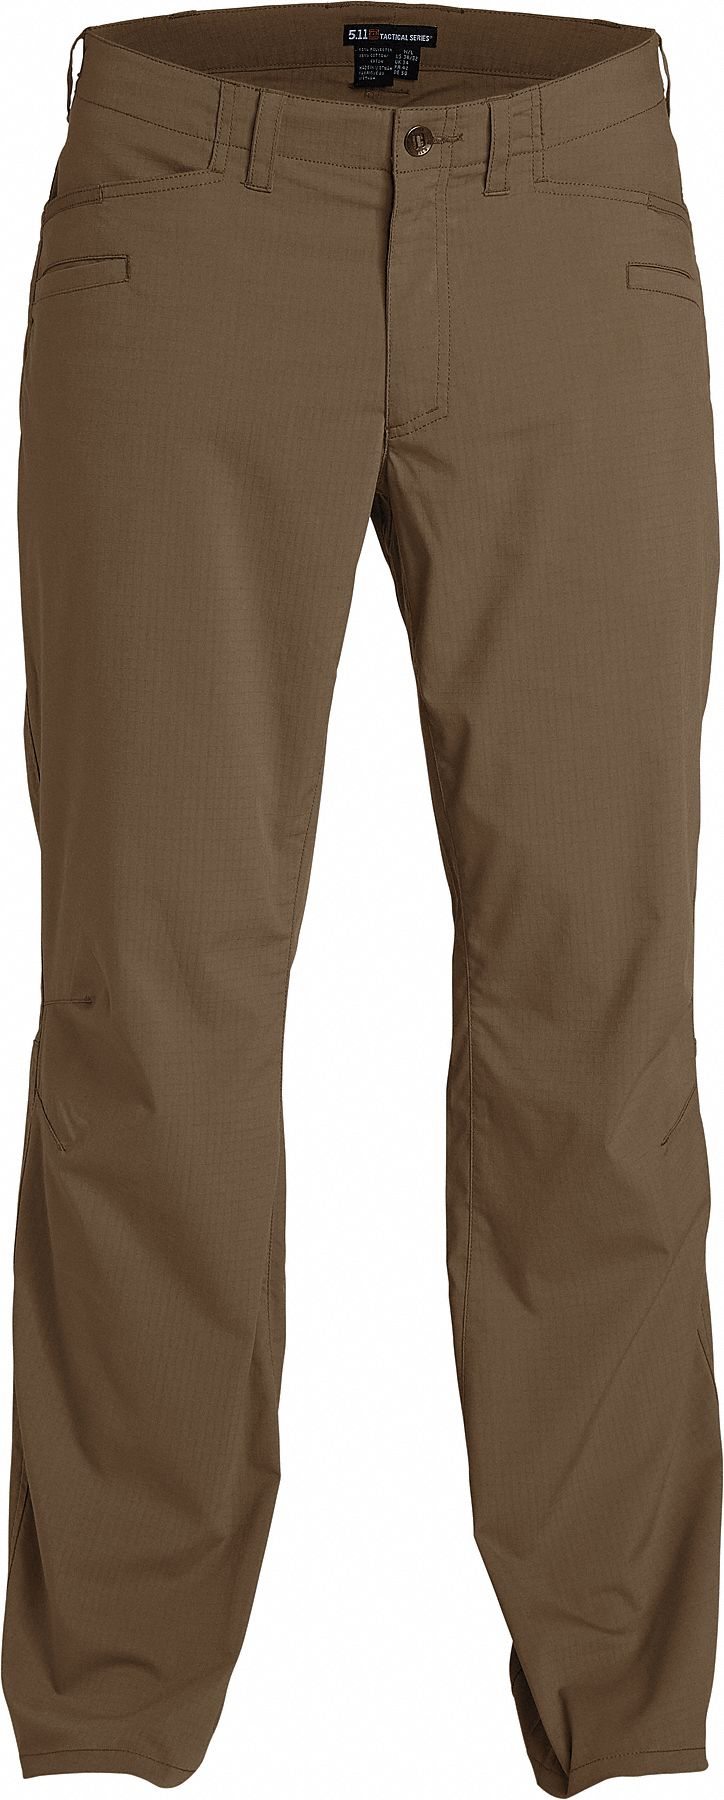 bd6a333a 5.11 TACTICAL Ridgeline Pants. Size: 33